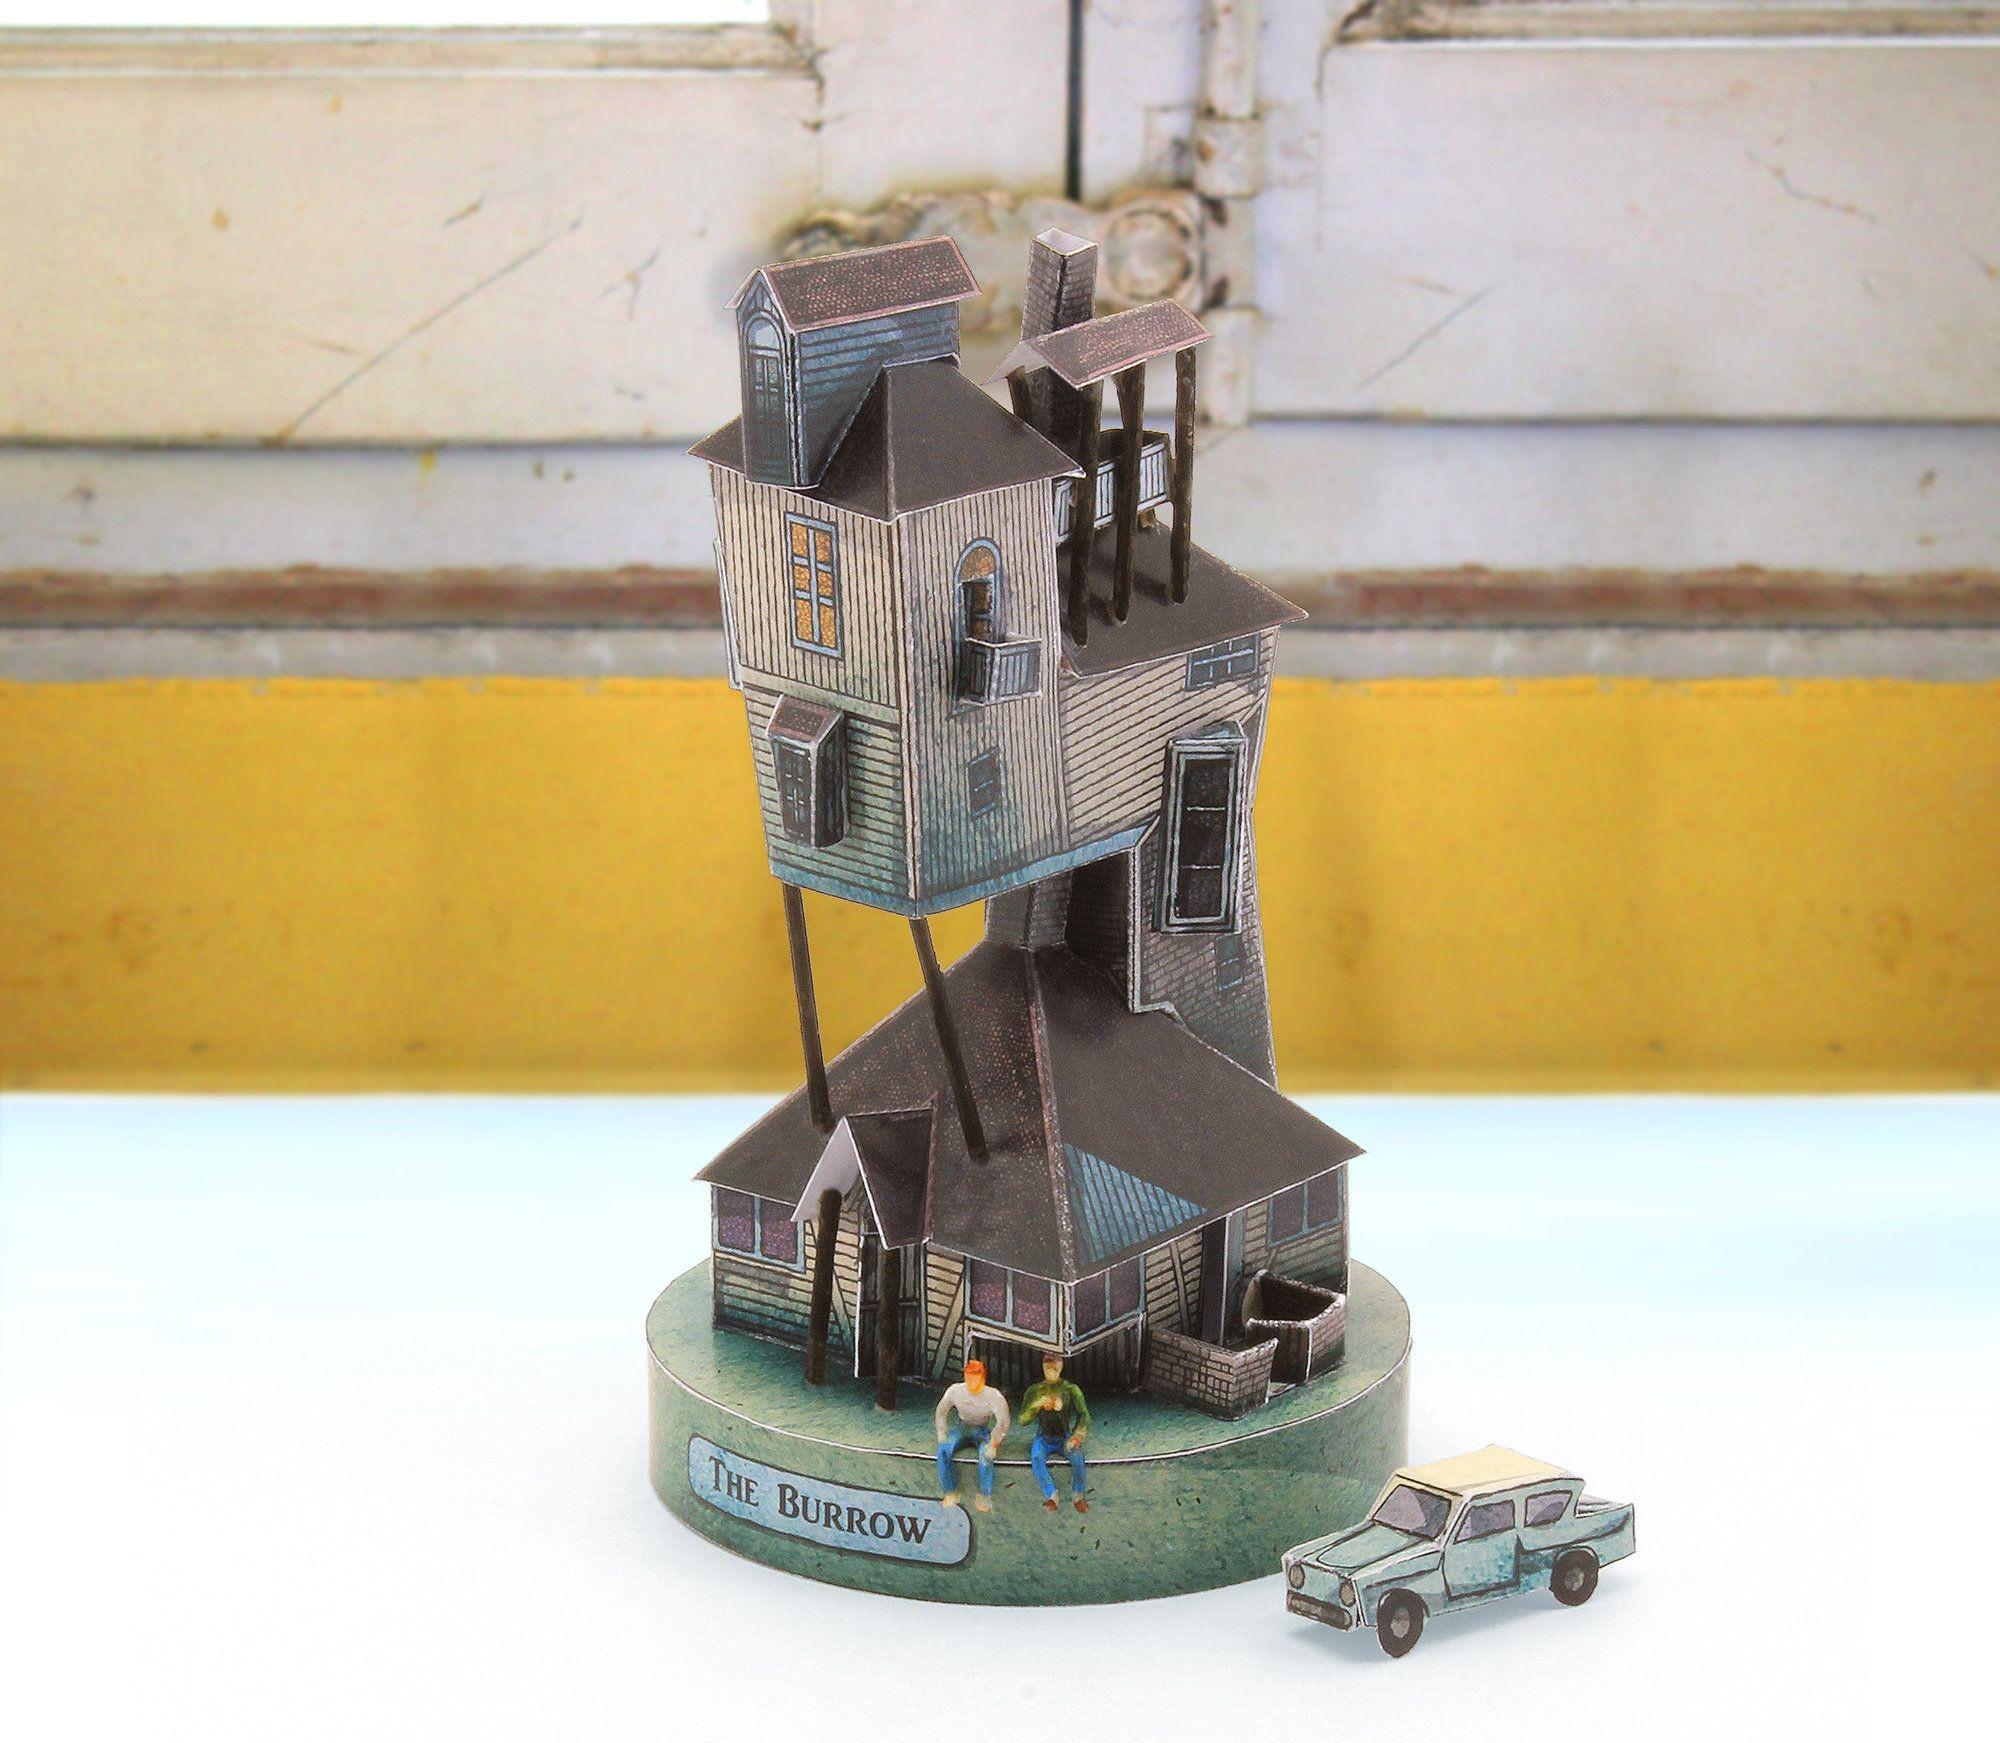 Hogwarts Papercraft the Burrow Papercraft Cut & assemble Paper Model Kit